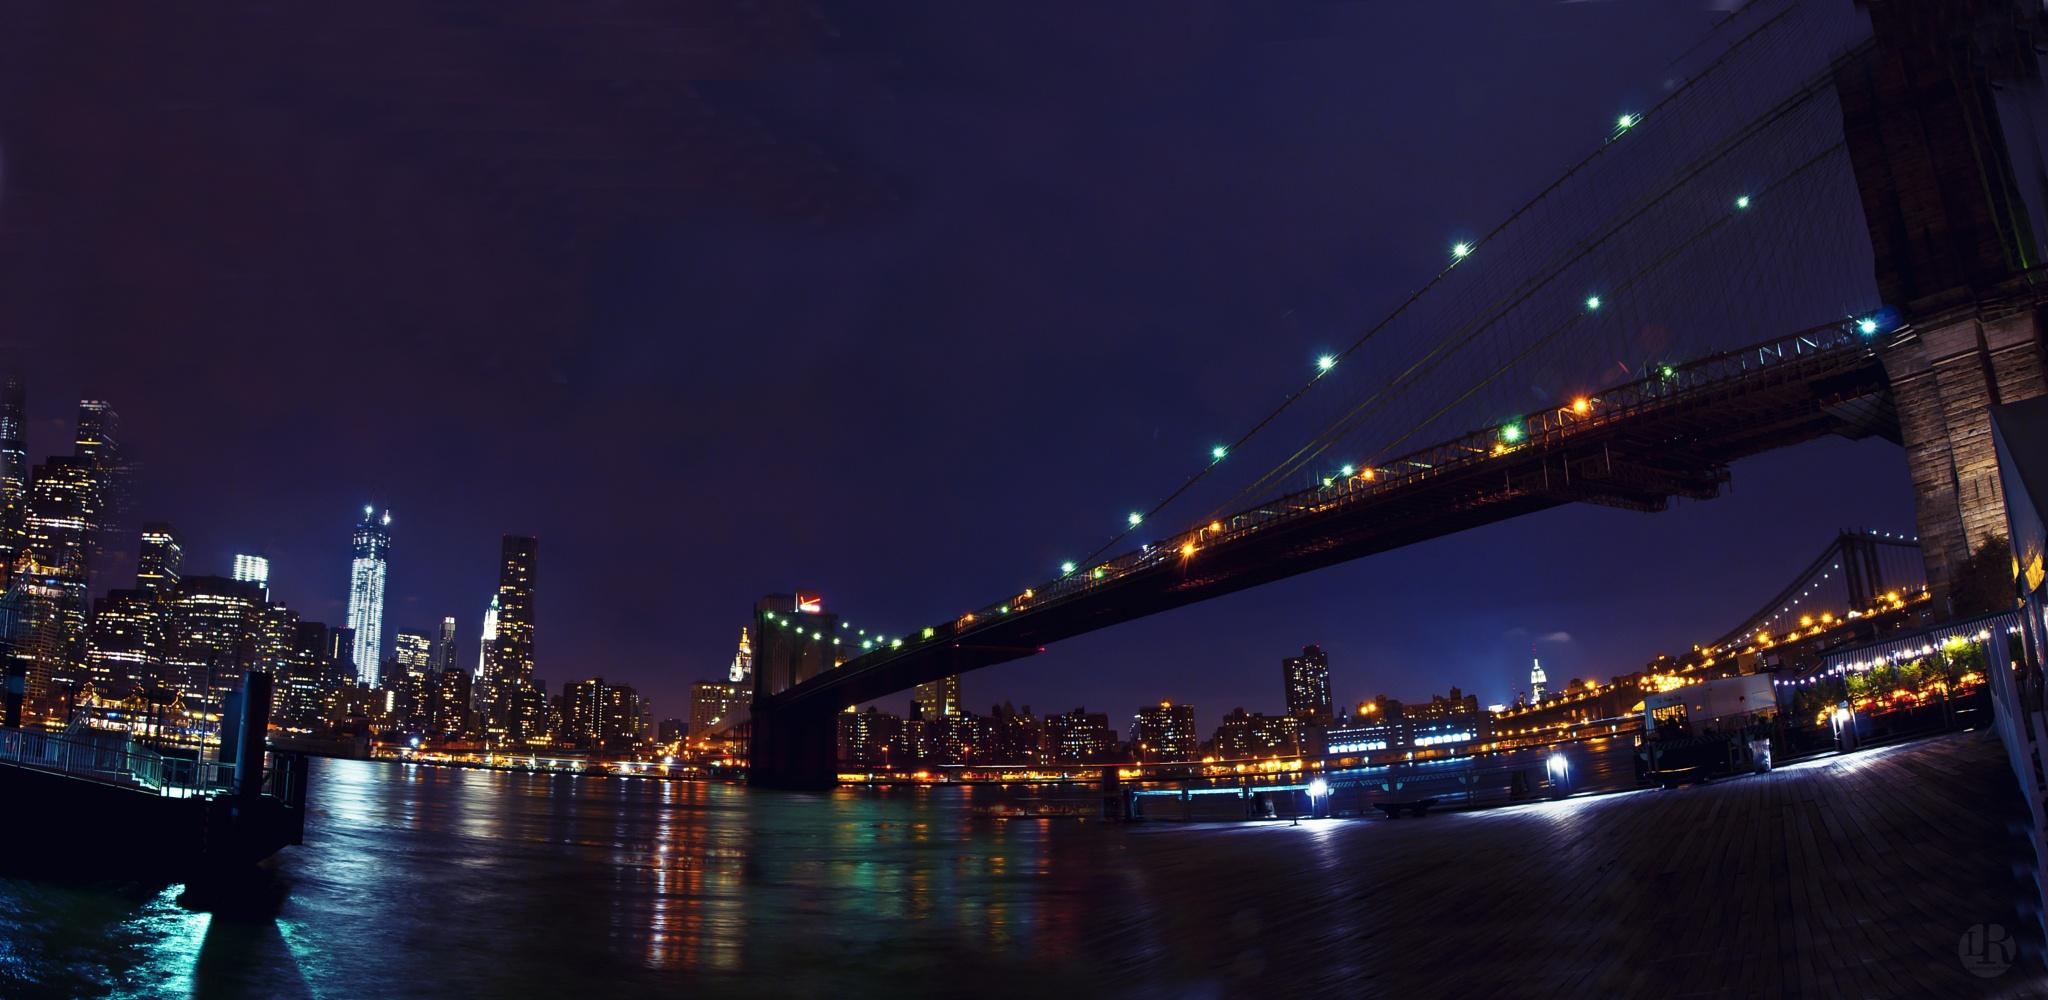 THE BRIDGE by Luigi R.